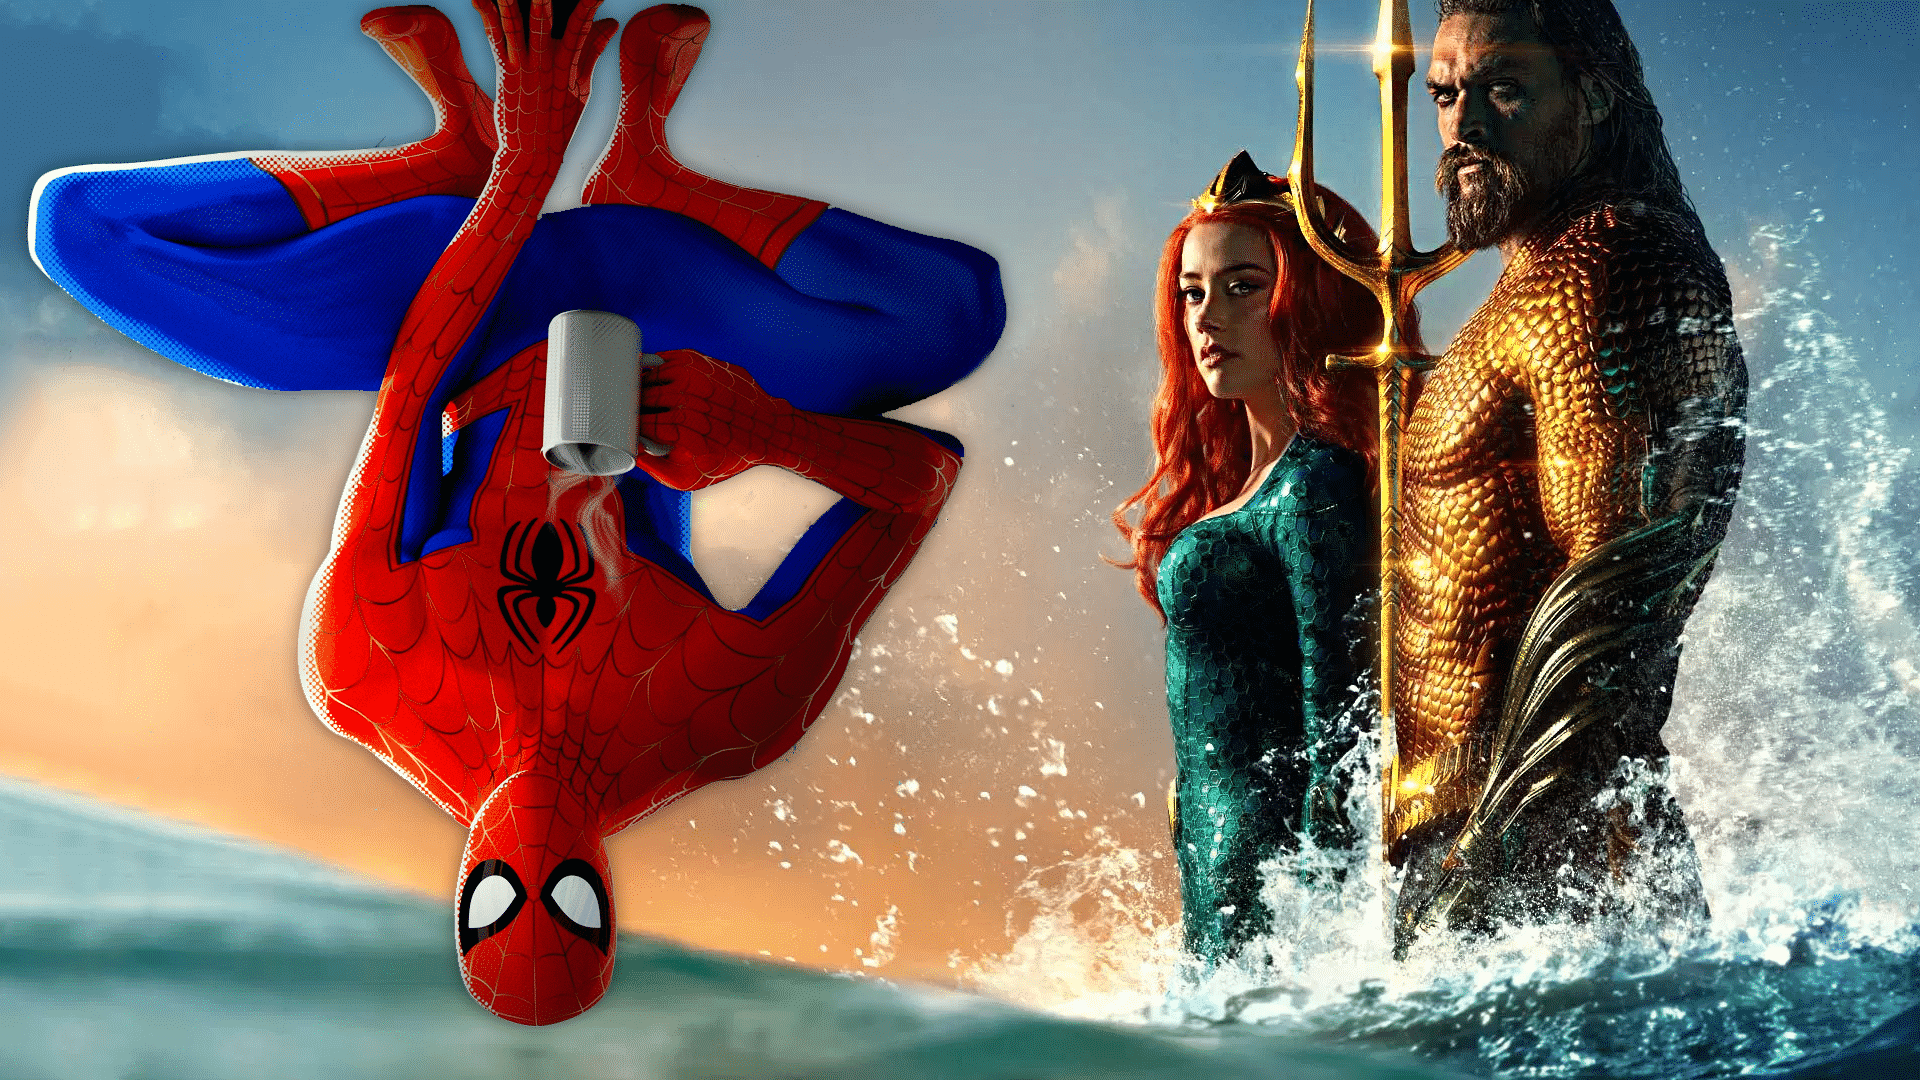 Spider-Man animák vs. DC film!